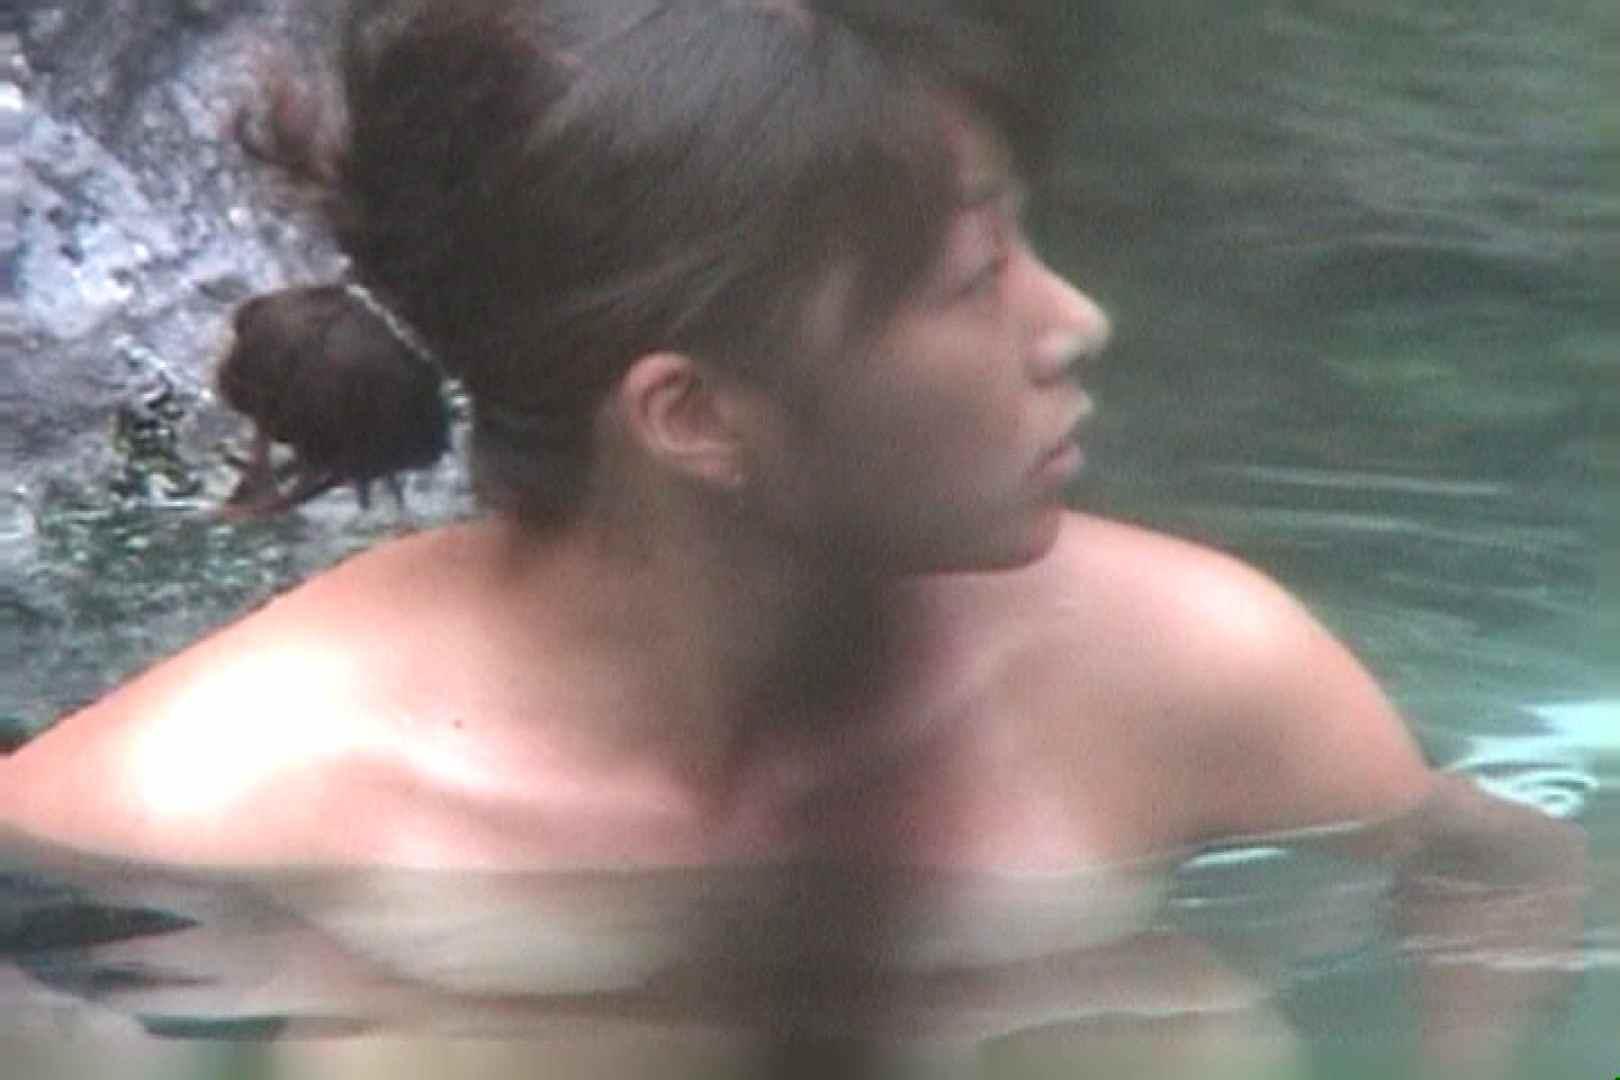 Aquaな露天風呂Vol.69【VIP限定】 OLのエロ生活   露天風呂  106連発 25